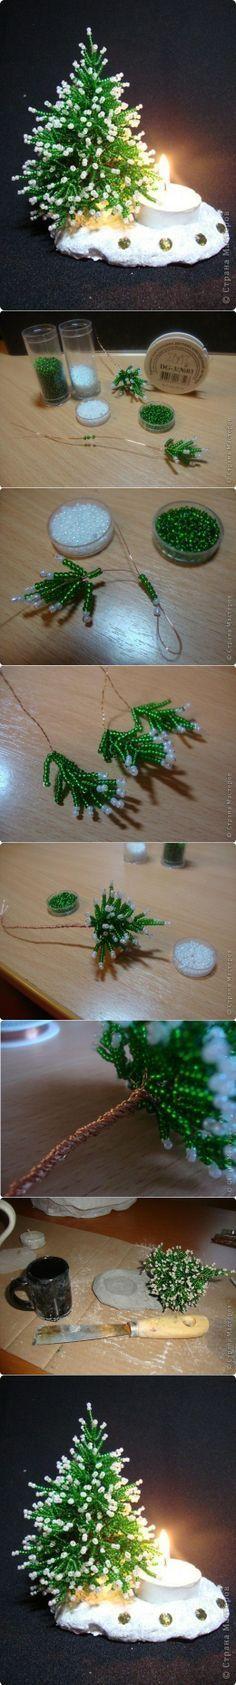 Herringbone Beans Miniature Christmas Tree http://www.goodshomedesign.com/herringbone-beans-miniature-christmas-tree/